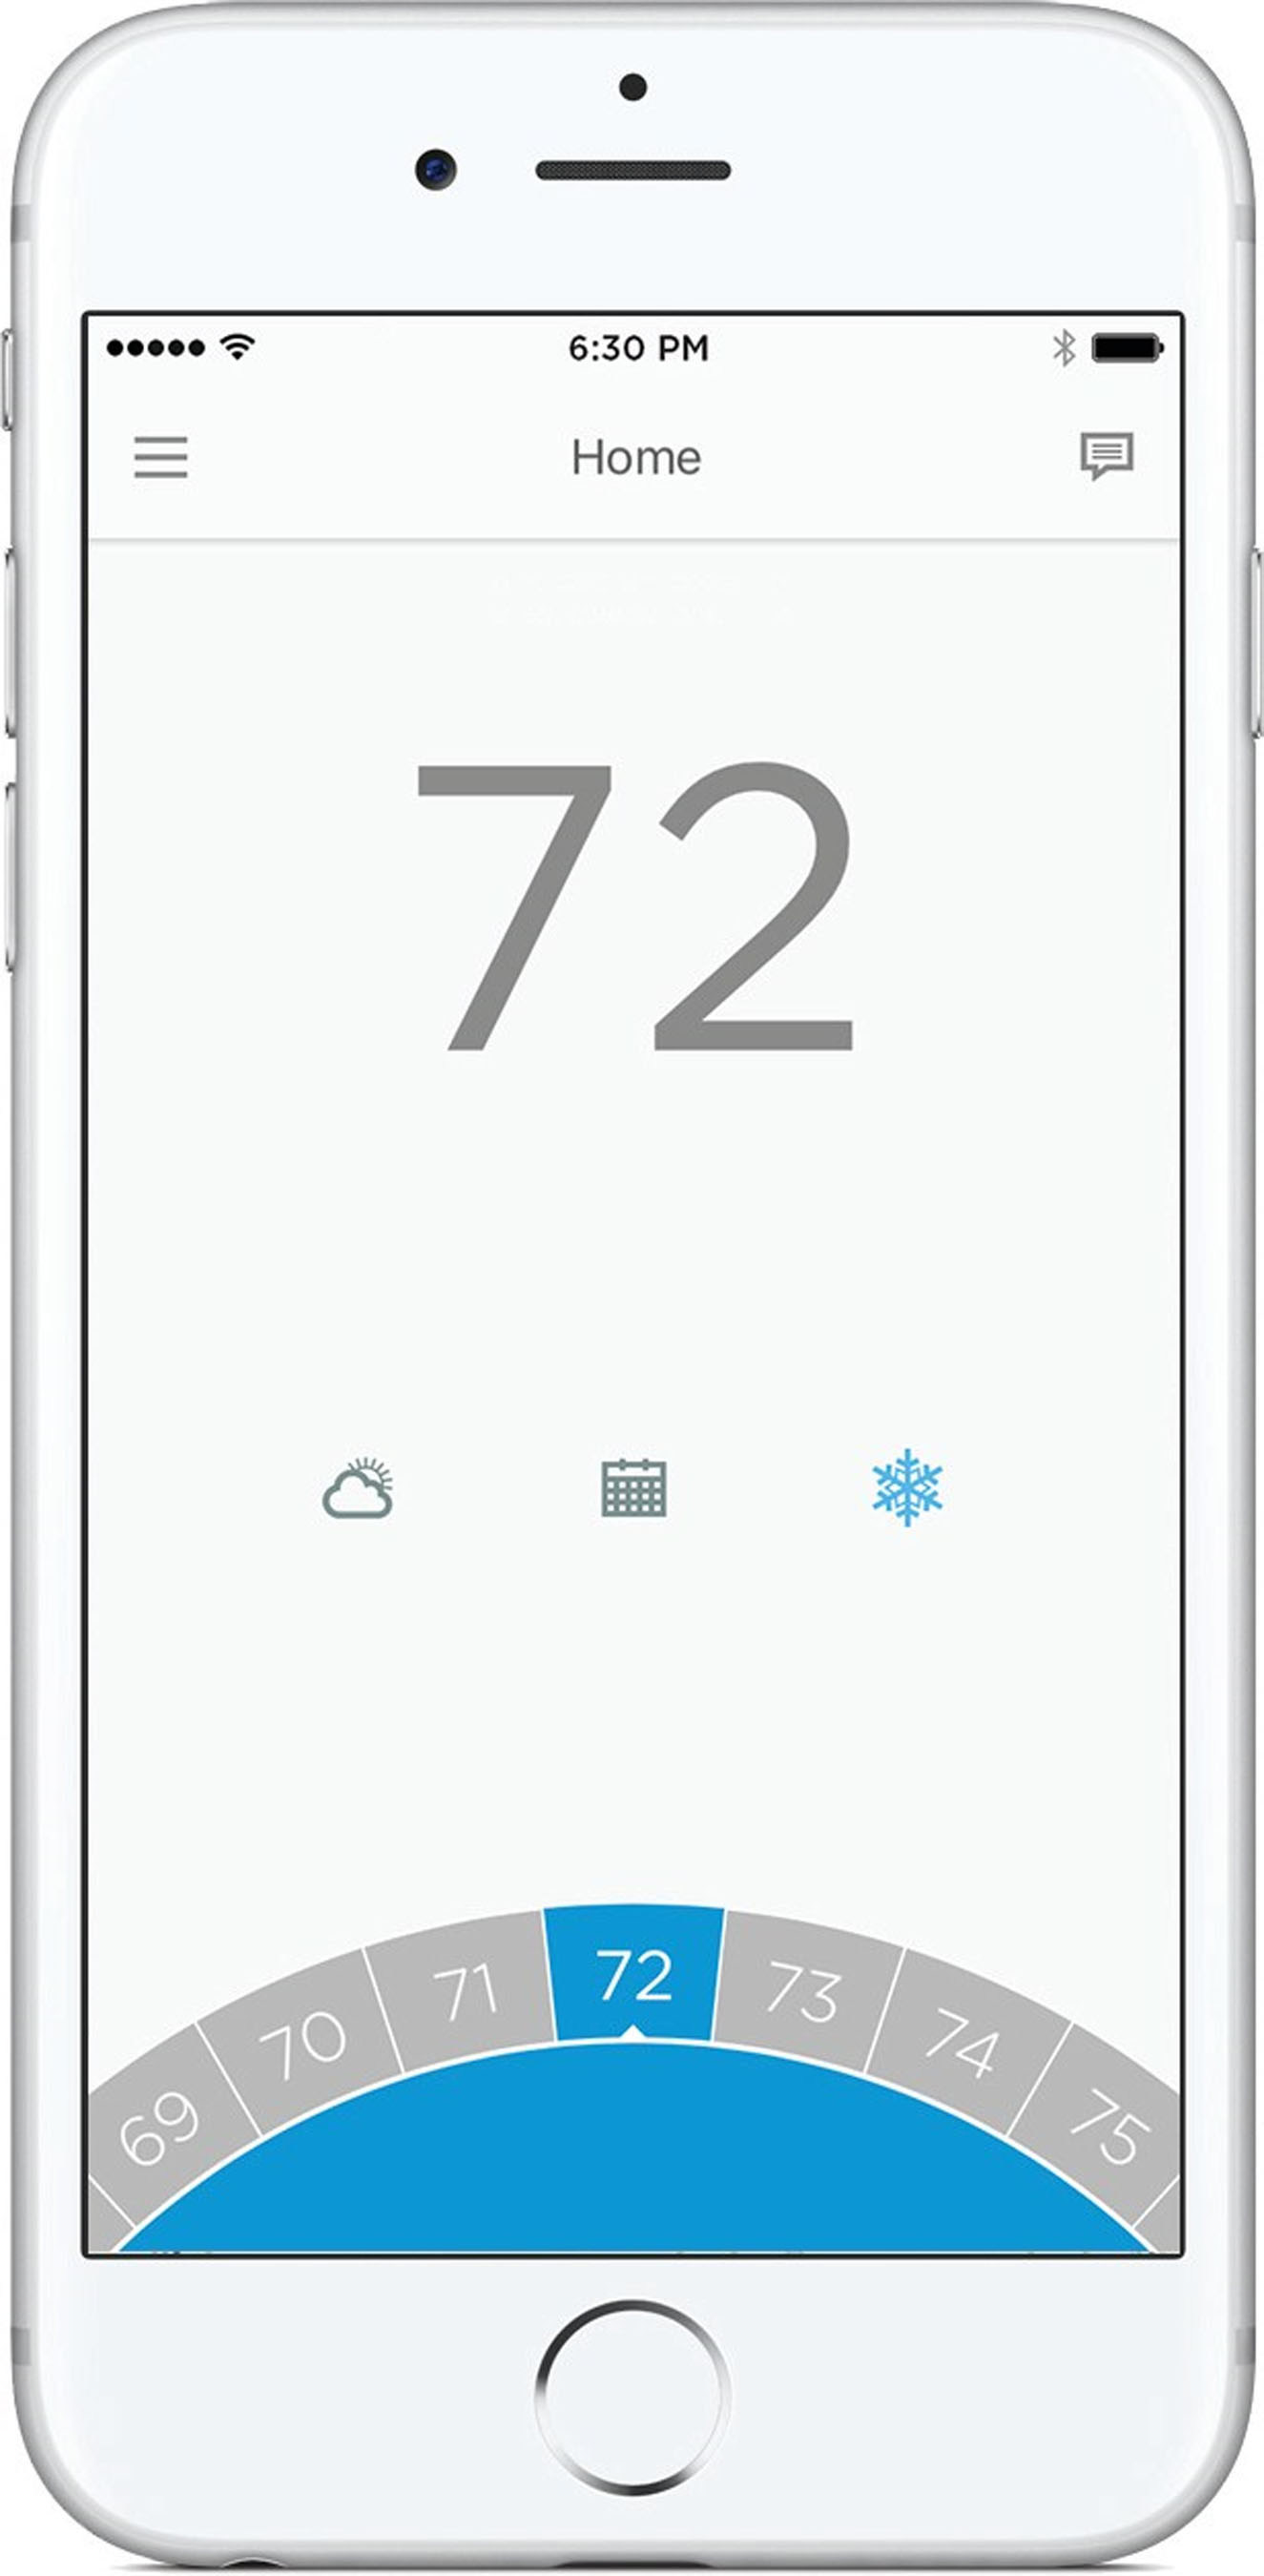 The Honeywell Lyric app, for the new Honeywell Lyric T5 Wi-Fi Thermostat.